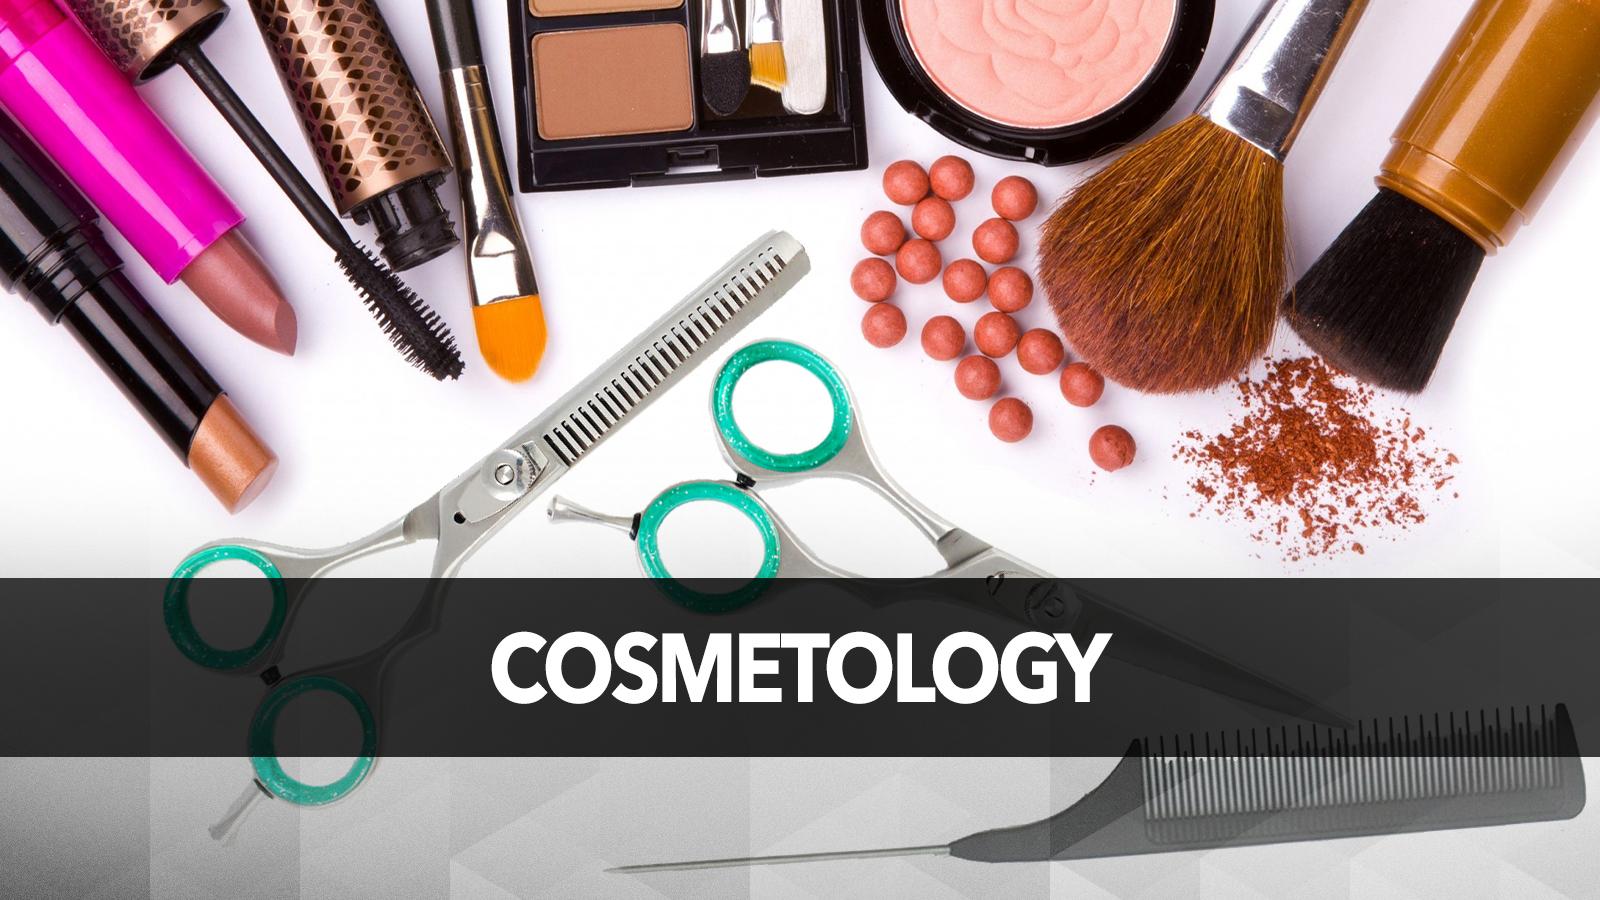 cosmetology polk education pathways